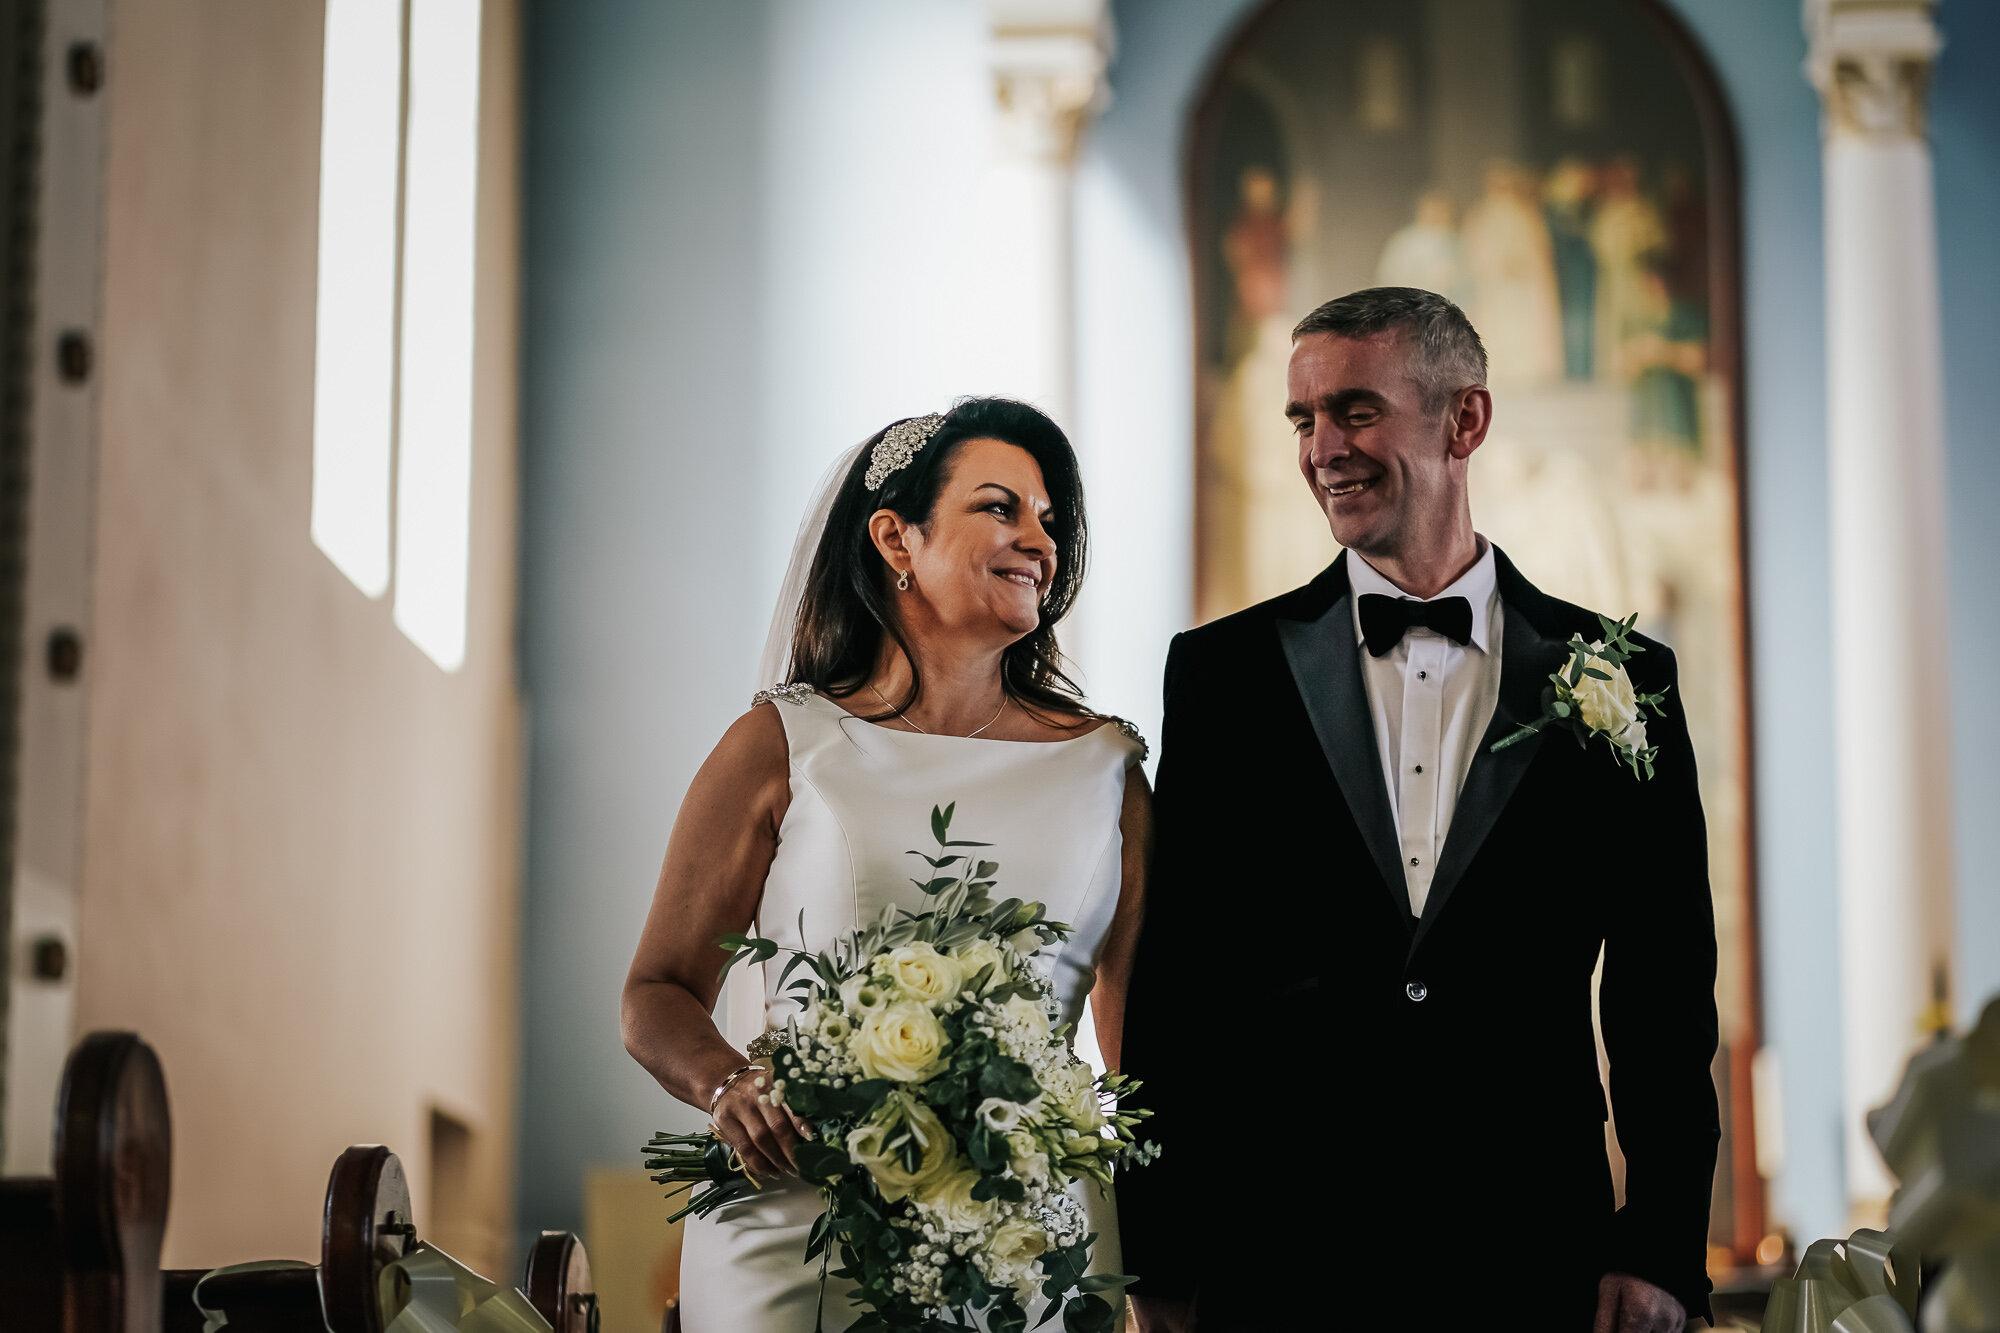 Clontarf Caste wedding photographer Wedding Photography dublin ireland wedding photographer (30 of 58).jpg